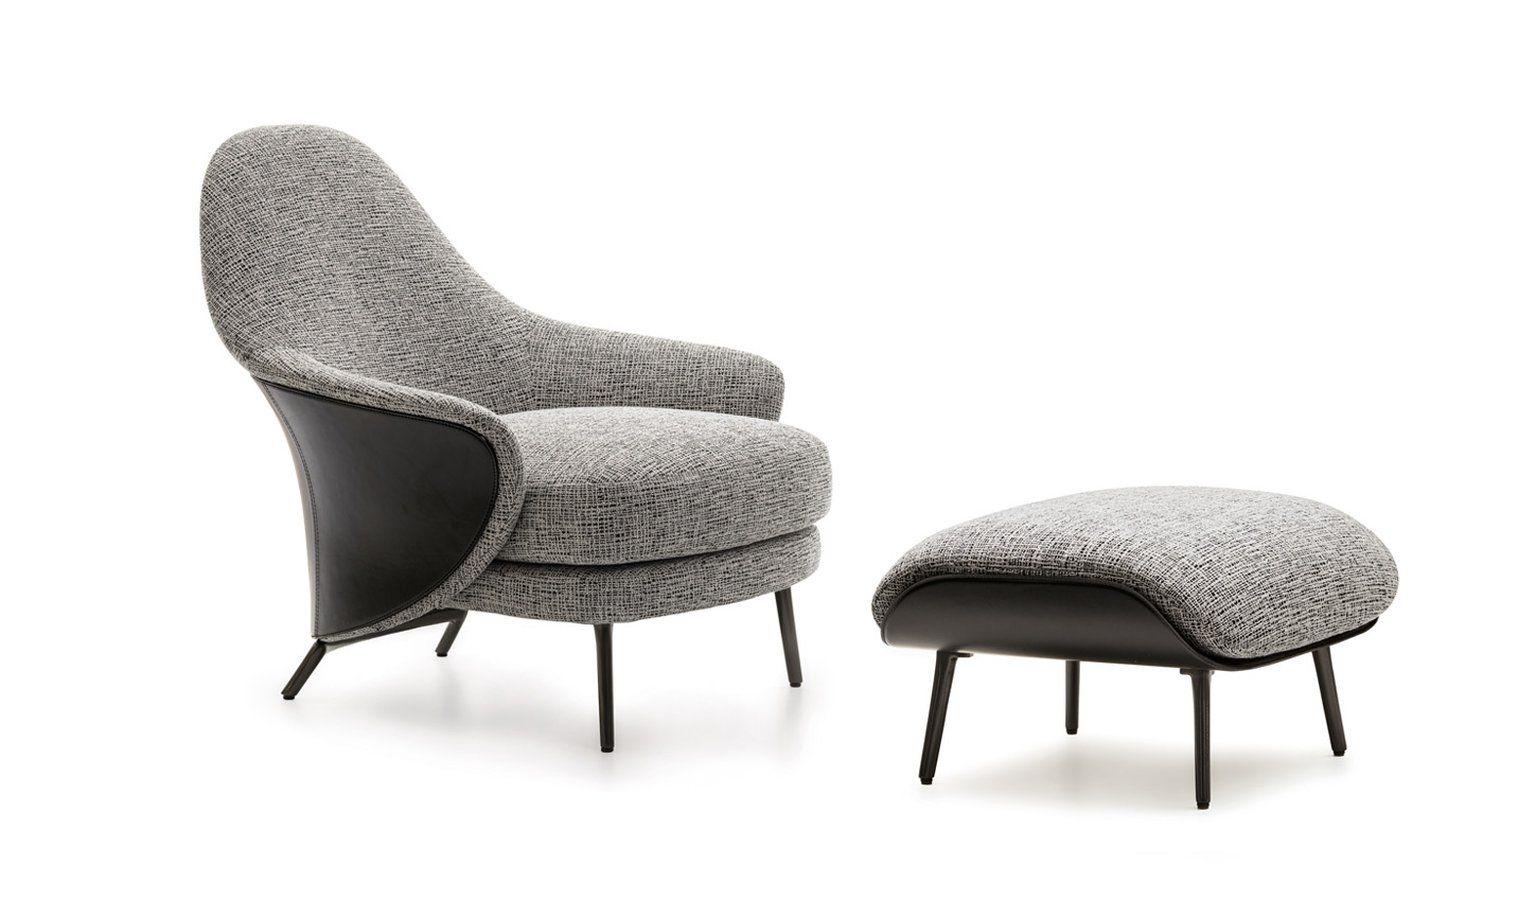 Angie Armchair By Minotti Ecc Armchair Furniture Futuristic Furniture